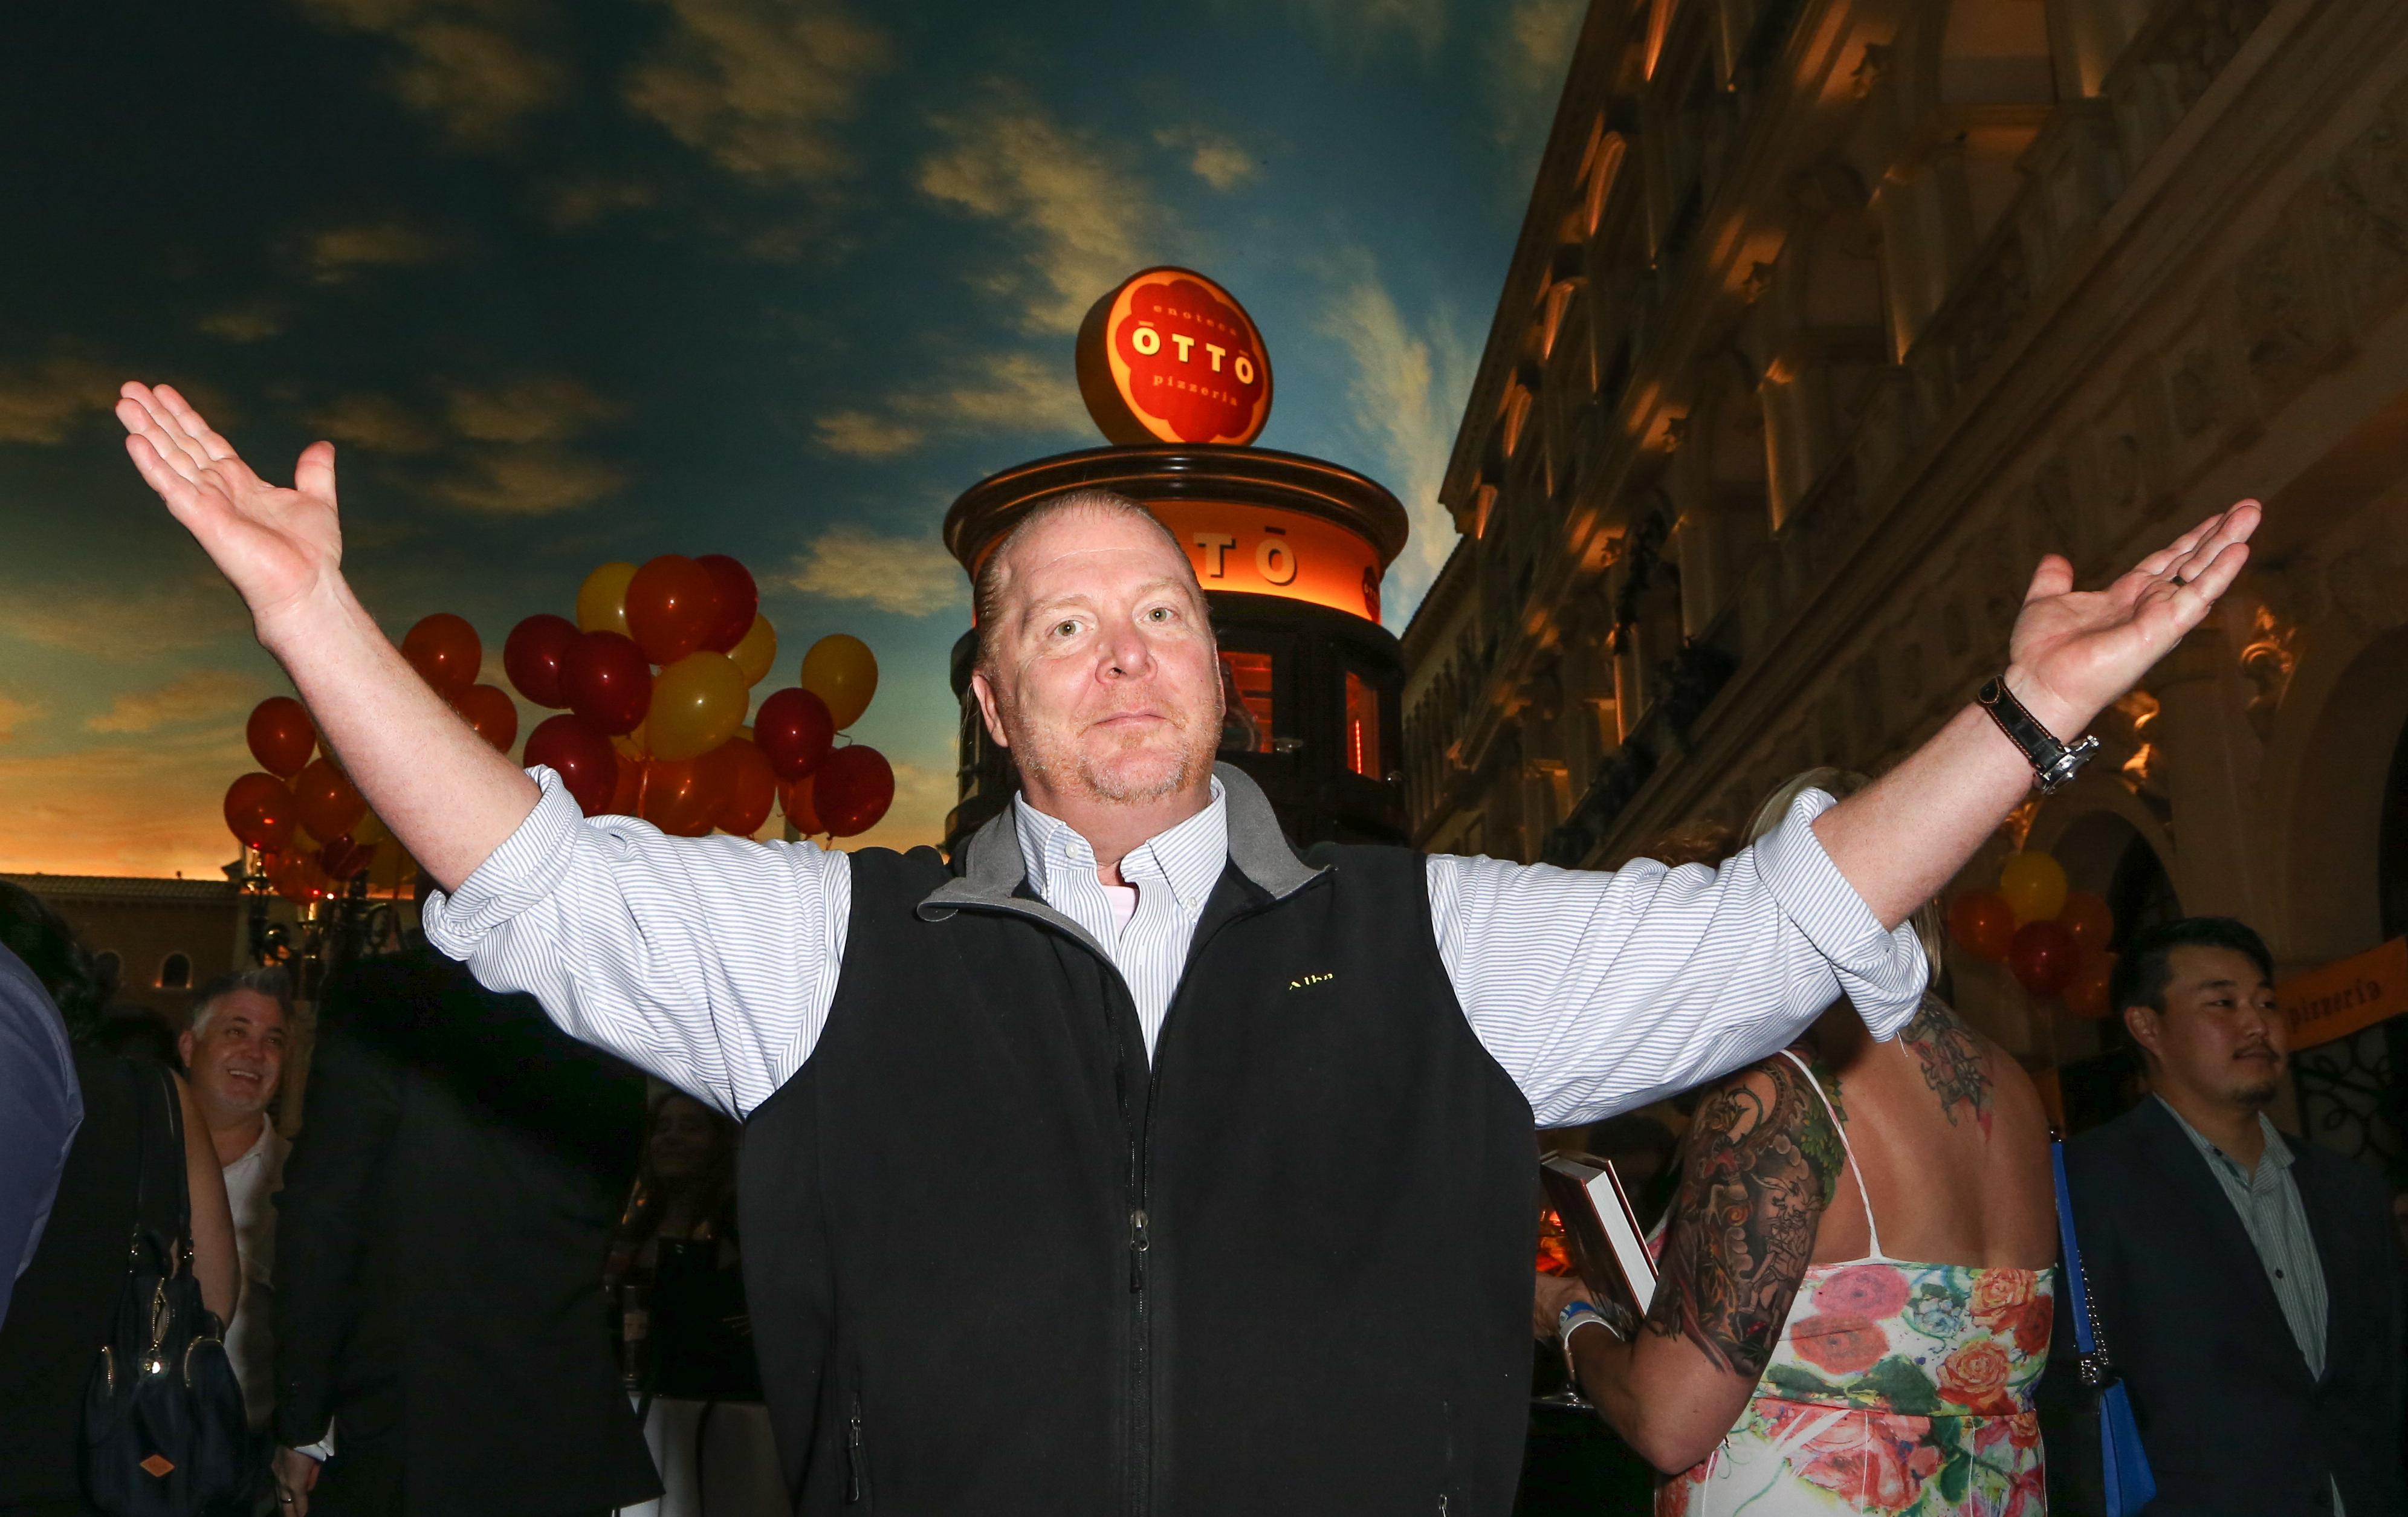 Mario Batali S Three Restaurants On The Las Vegas Strip To Close July 27 Eater